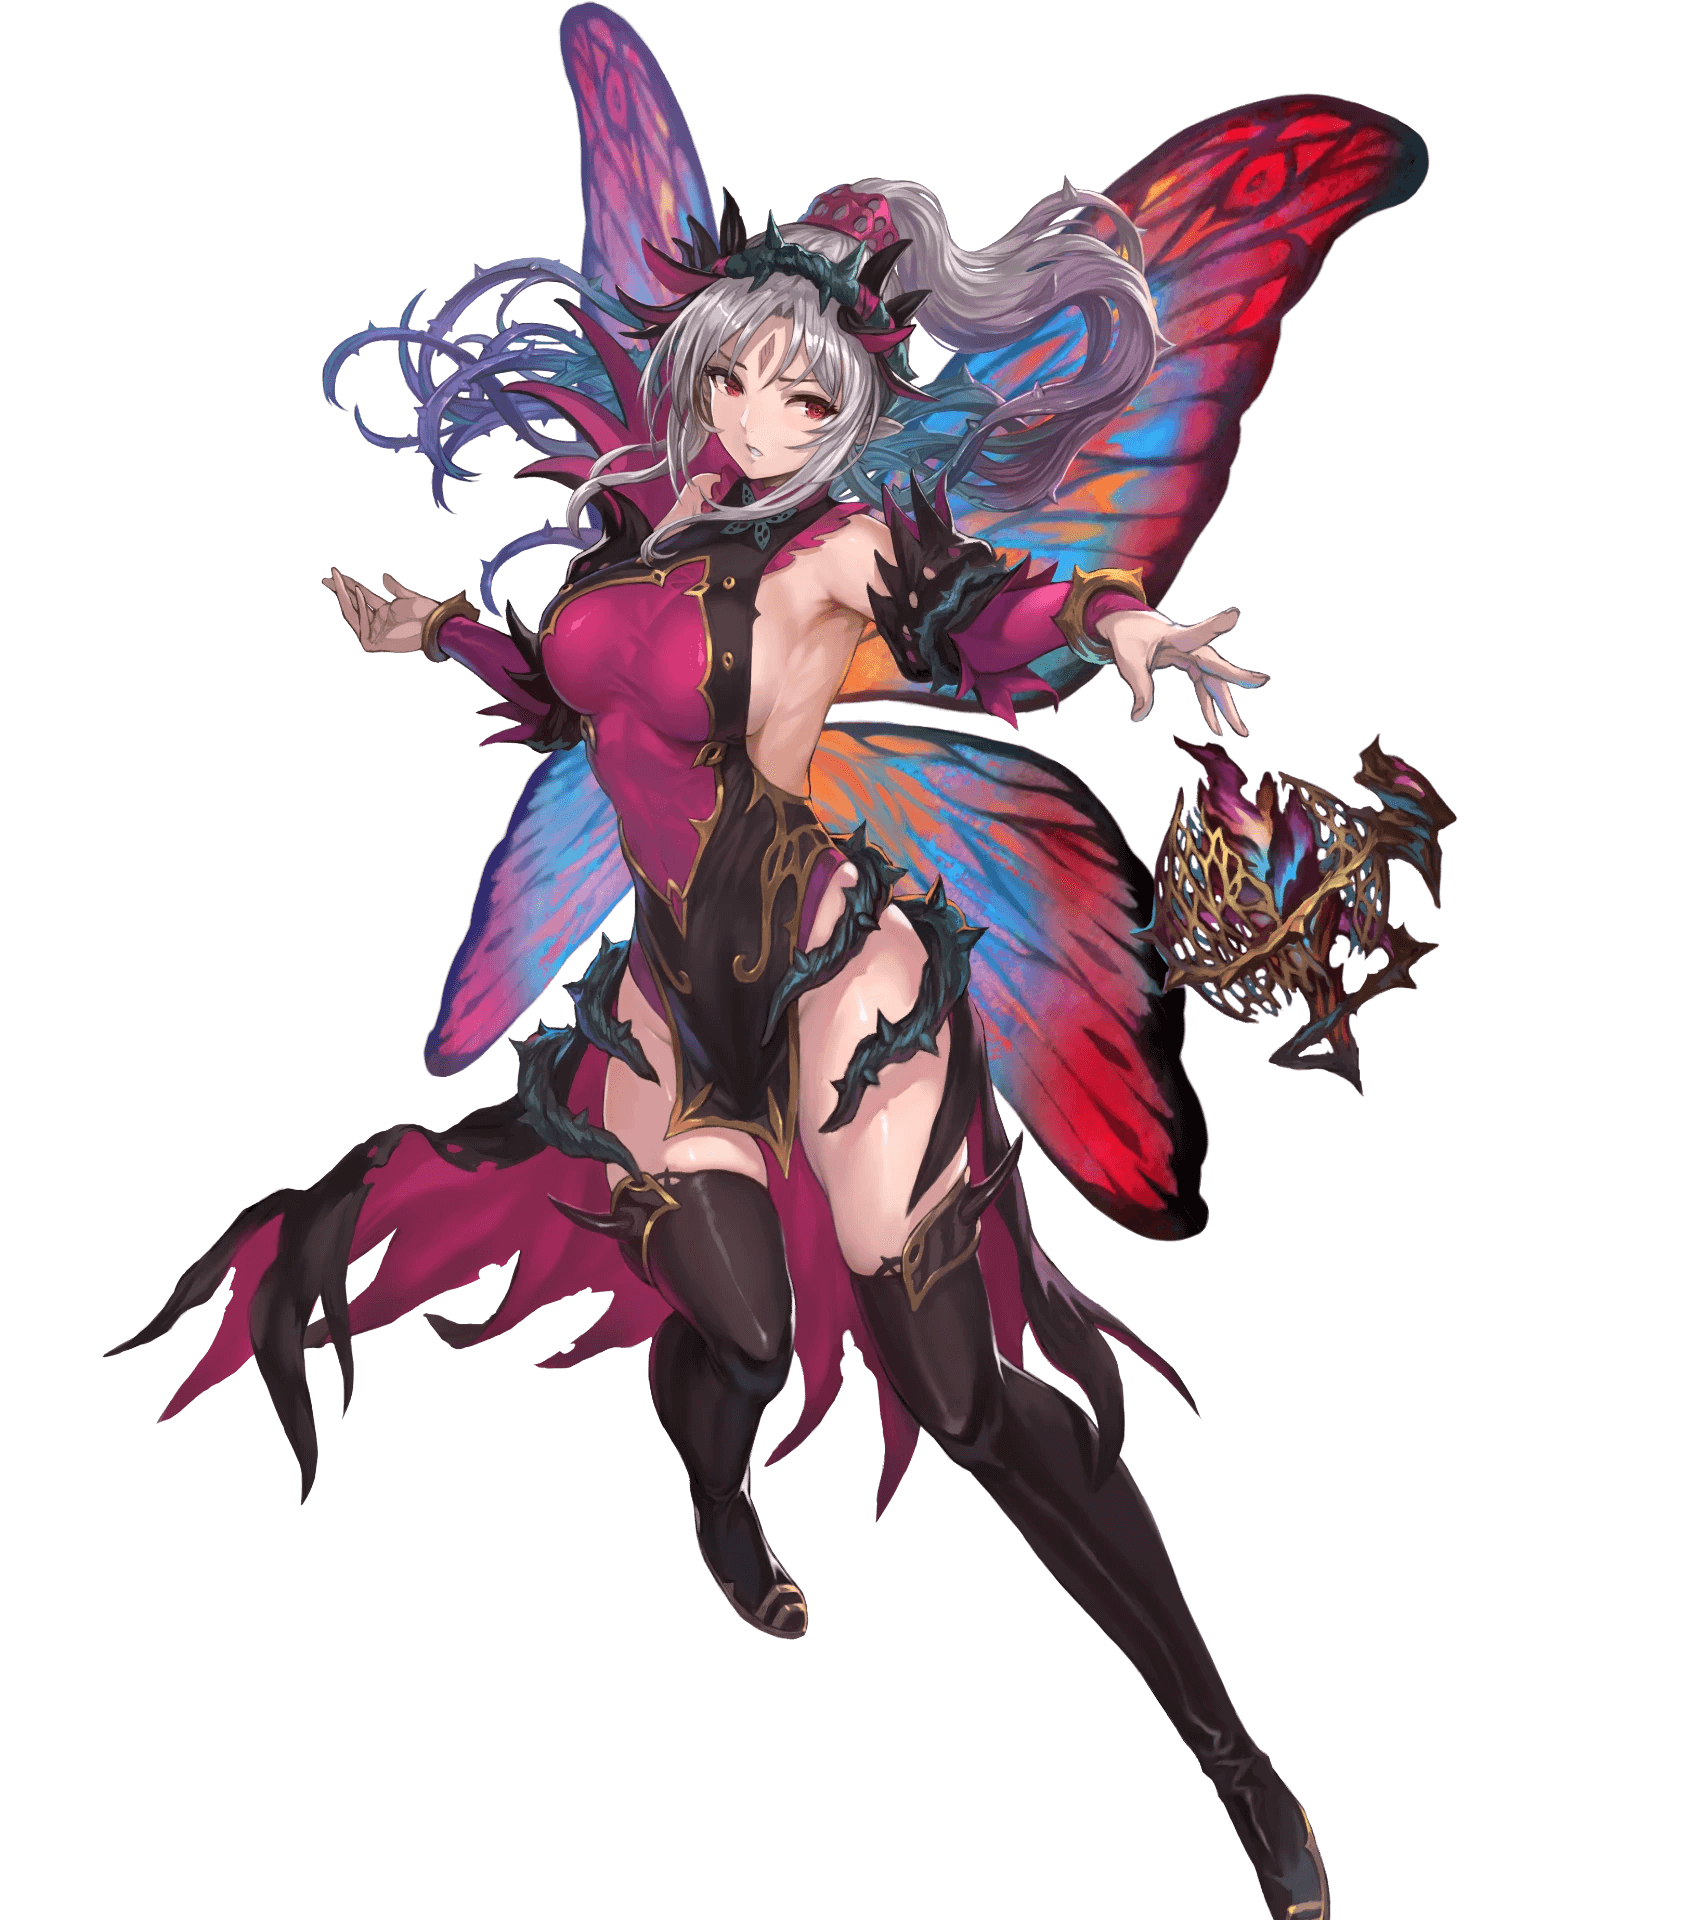 Plumeria | Fire Emblem Heroes Wiki - GamePress